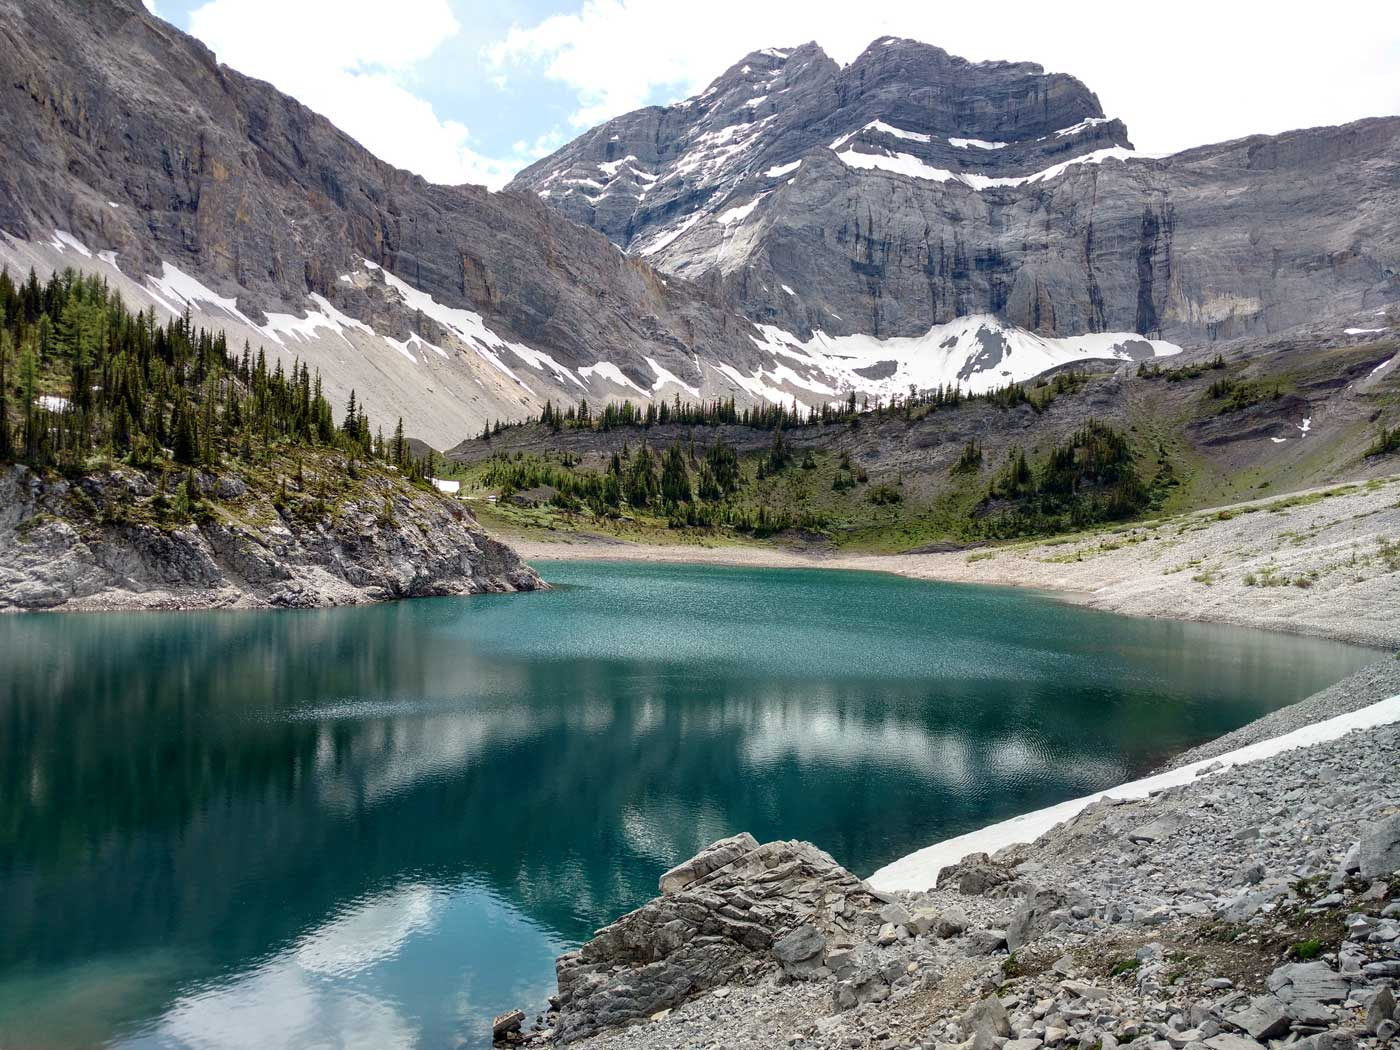 Lower Galatea Lake in Kananaskis Country, Alberta, Canada.